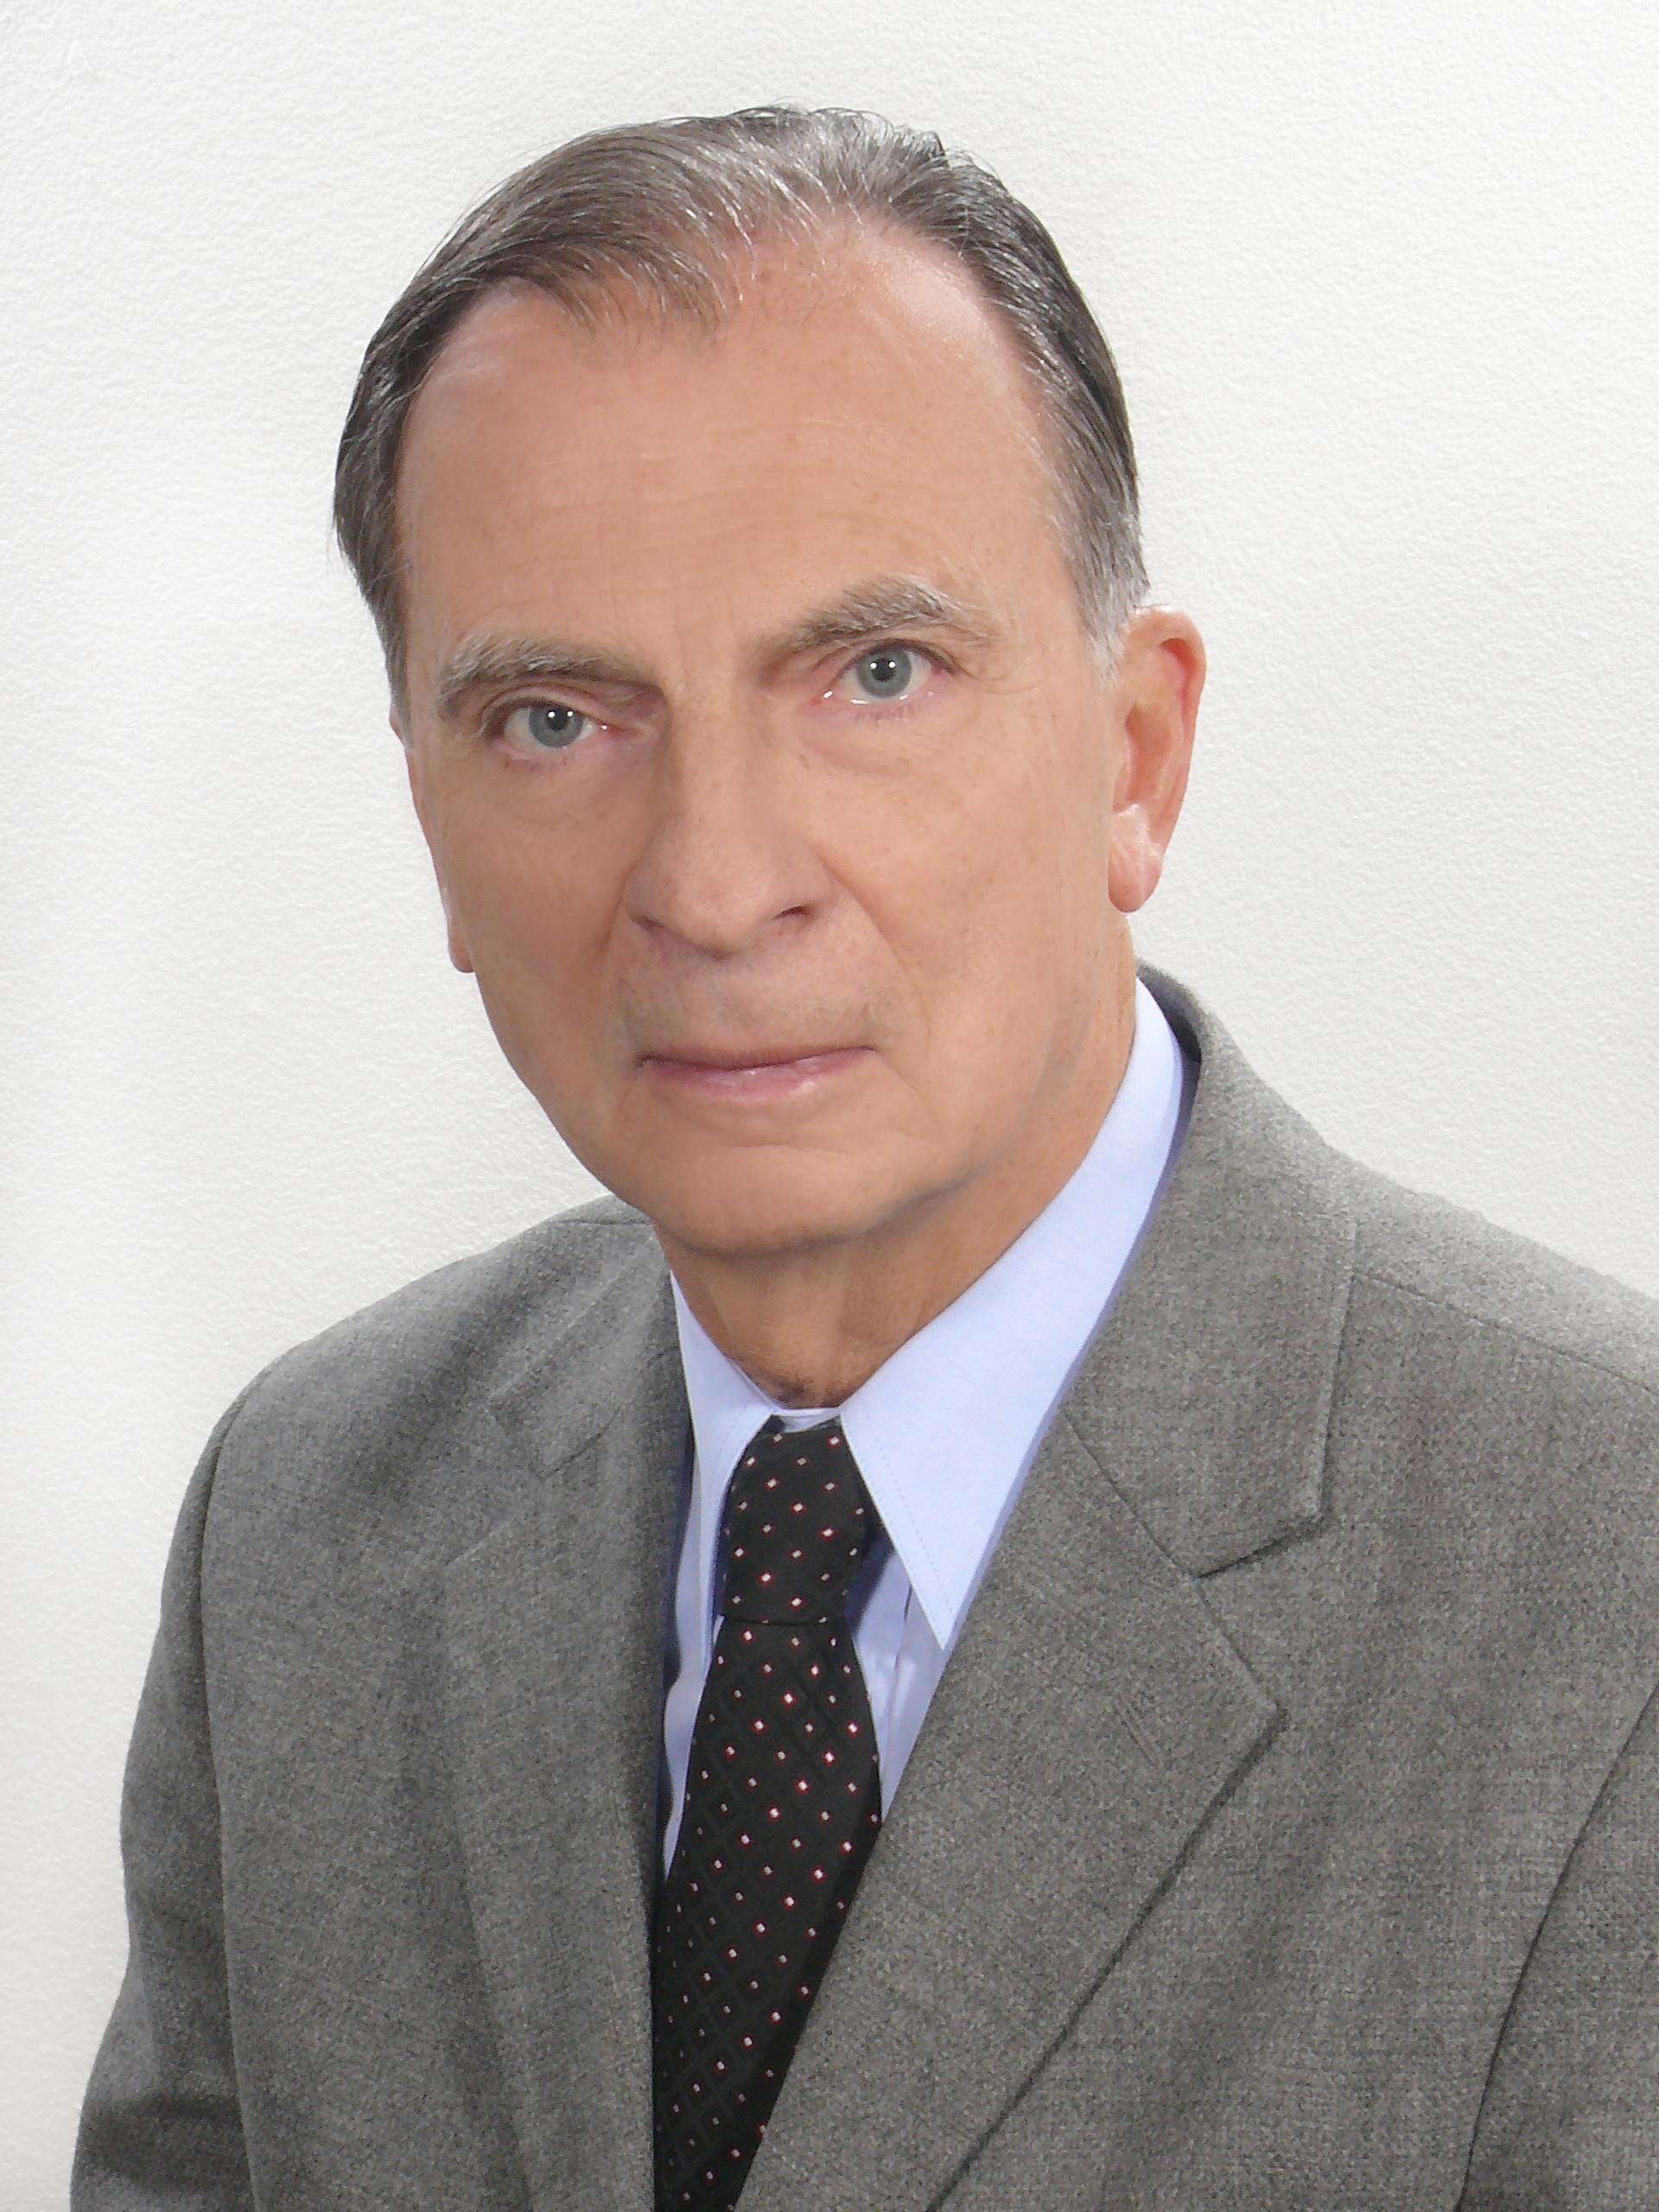 Závodszky Géza tanár, tankönyvszerző